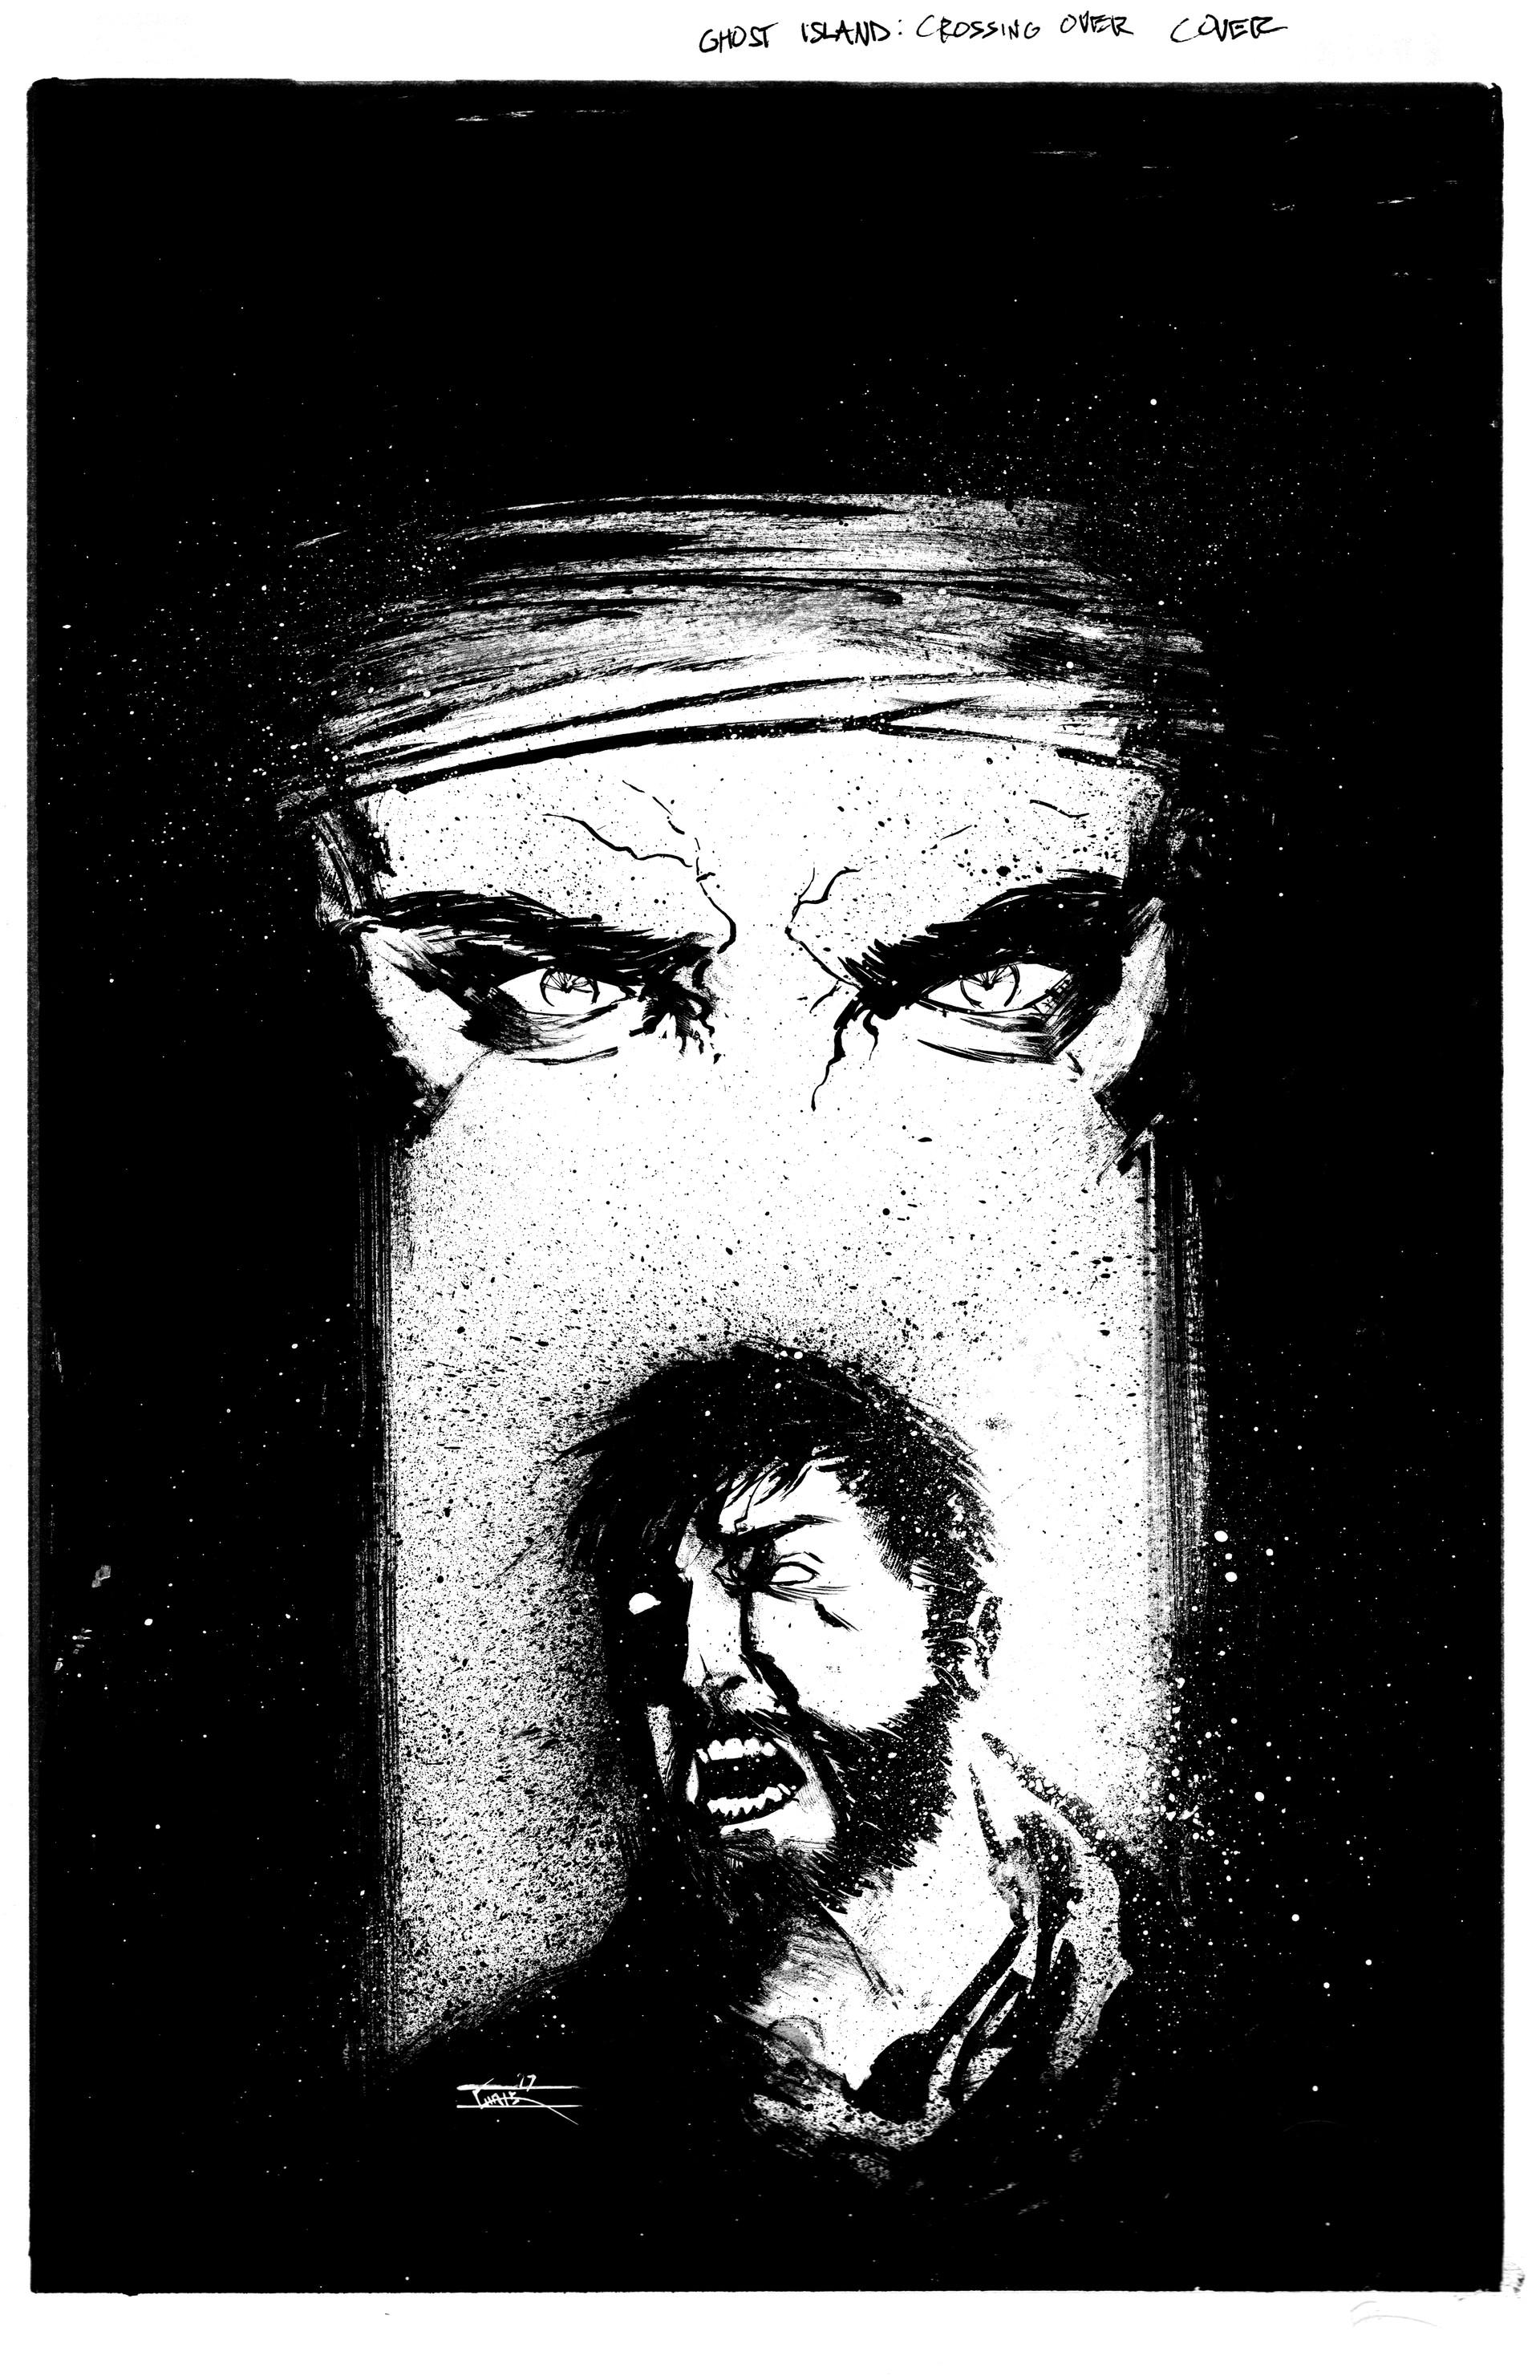 Chris shehan ghost island cover inks